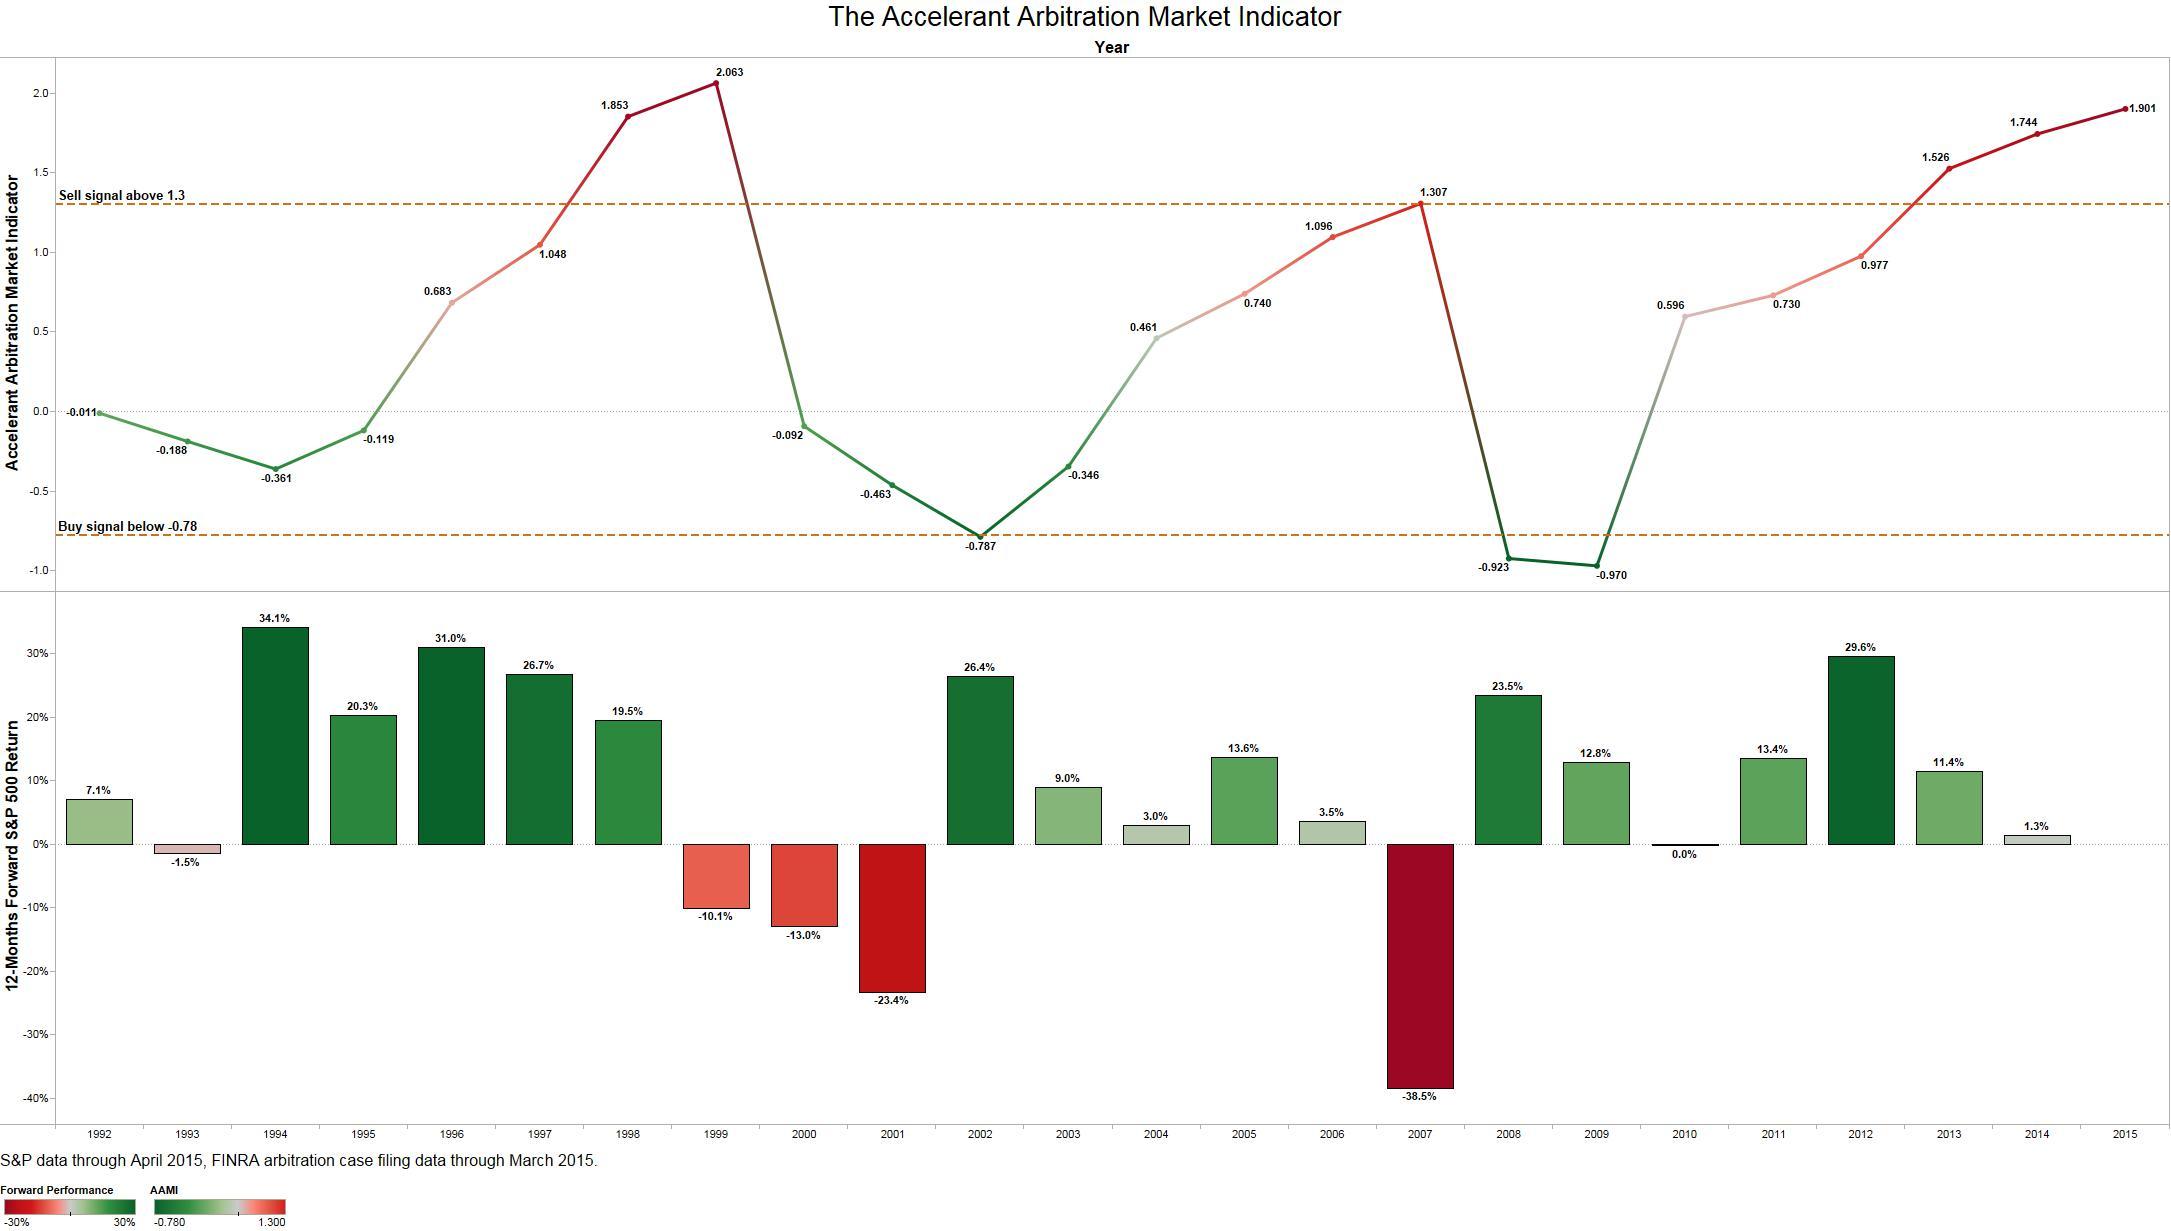 Accelerant_Arbitration_Market_Indicator